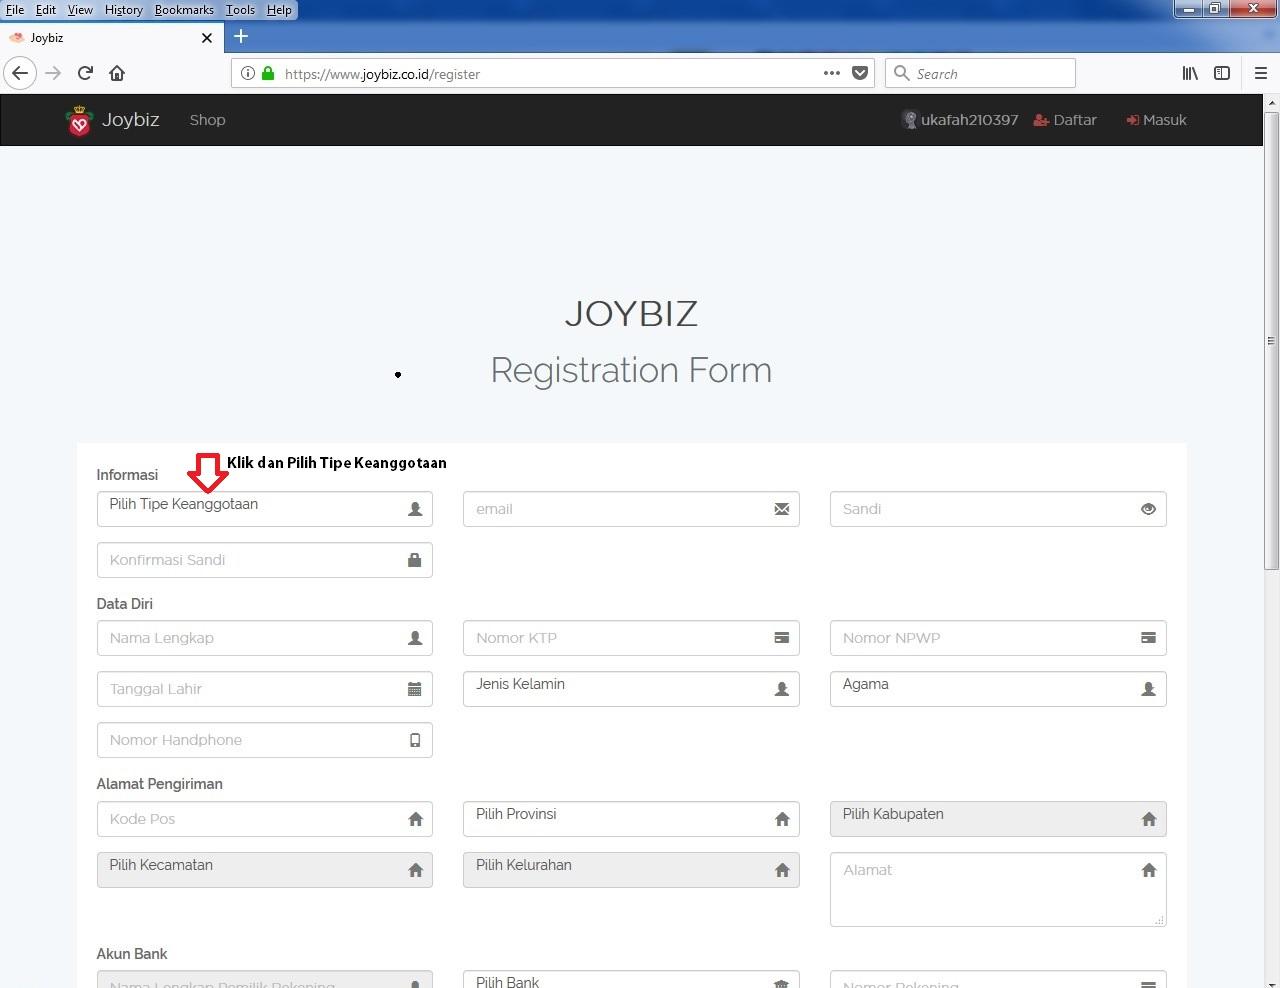 Pilih Tipe Keanggotaan Member Joybiz